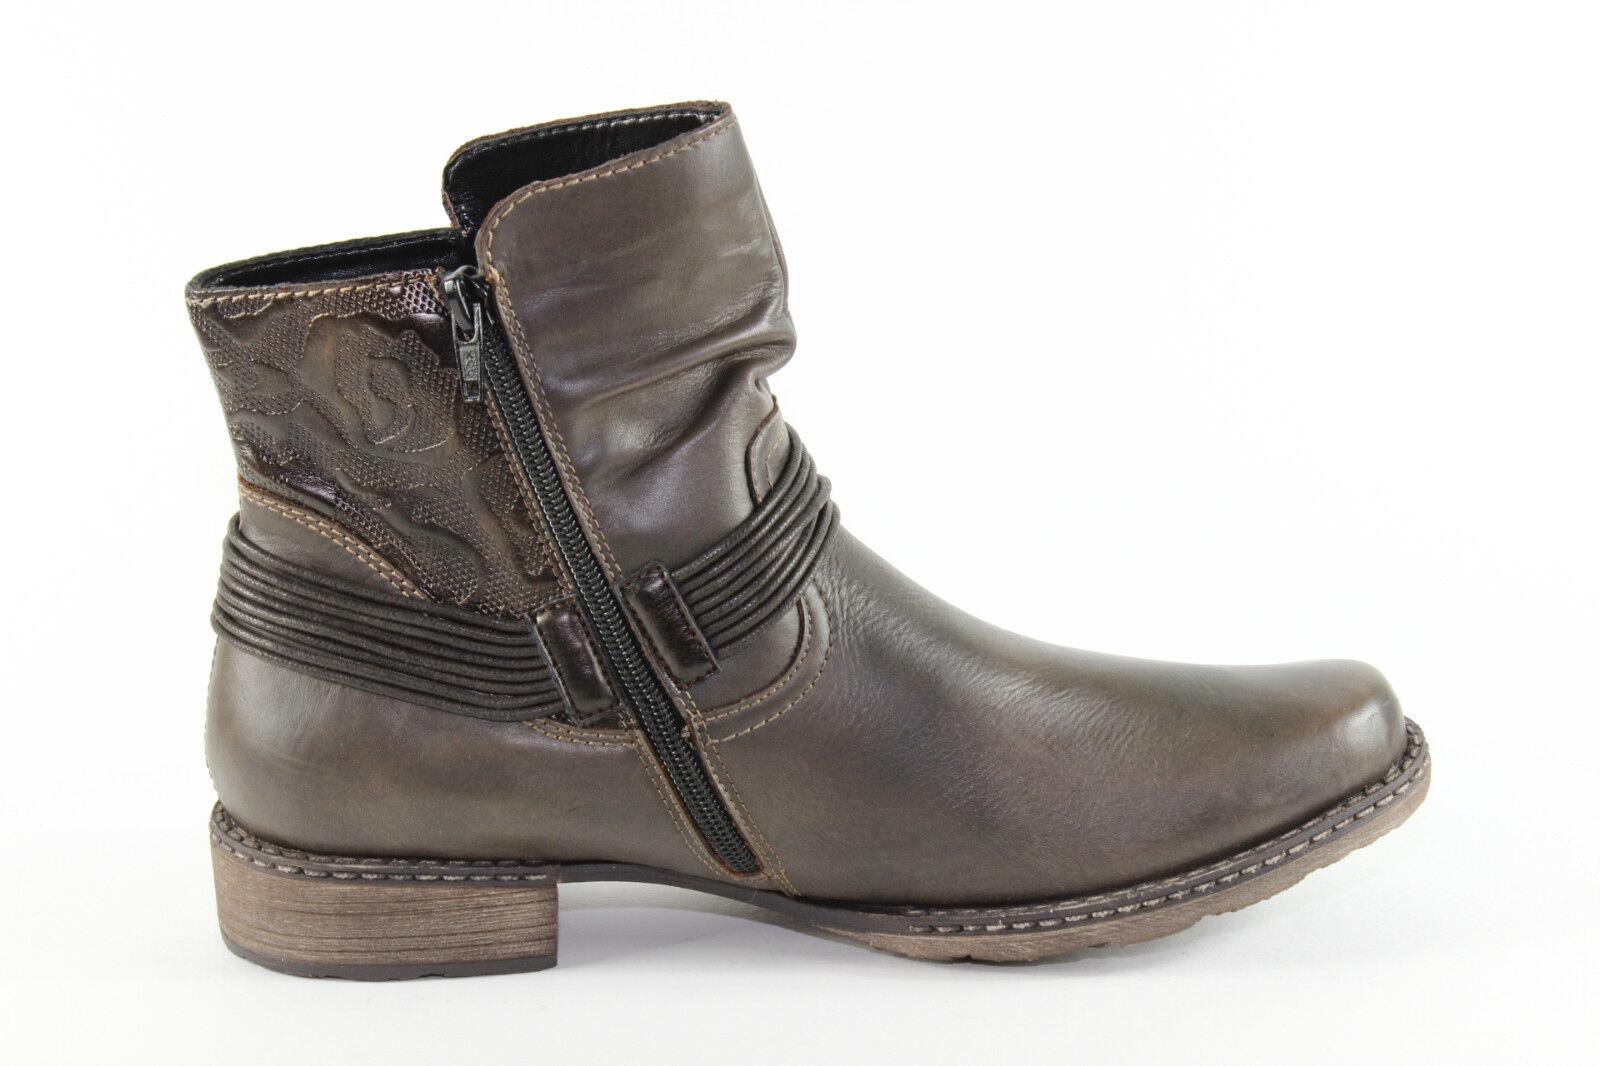 Remonte D4363-27, warme Stiefelette aus braunem Leder, Damenschuhe Übergröße Übergröße Damenschuhe 4b53a8